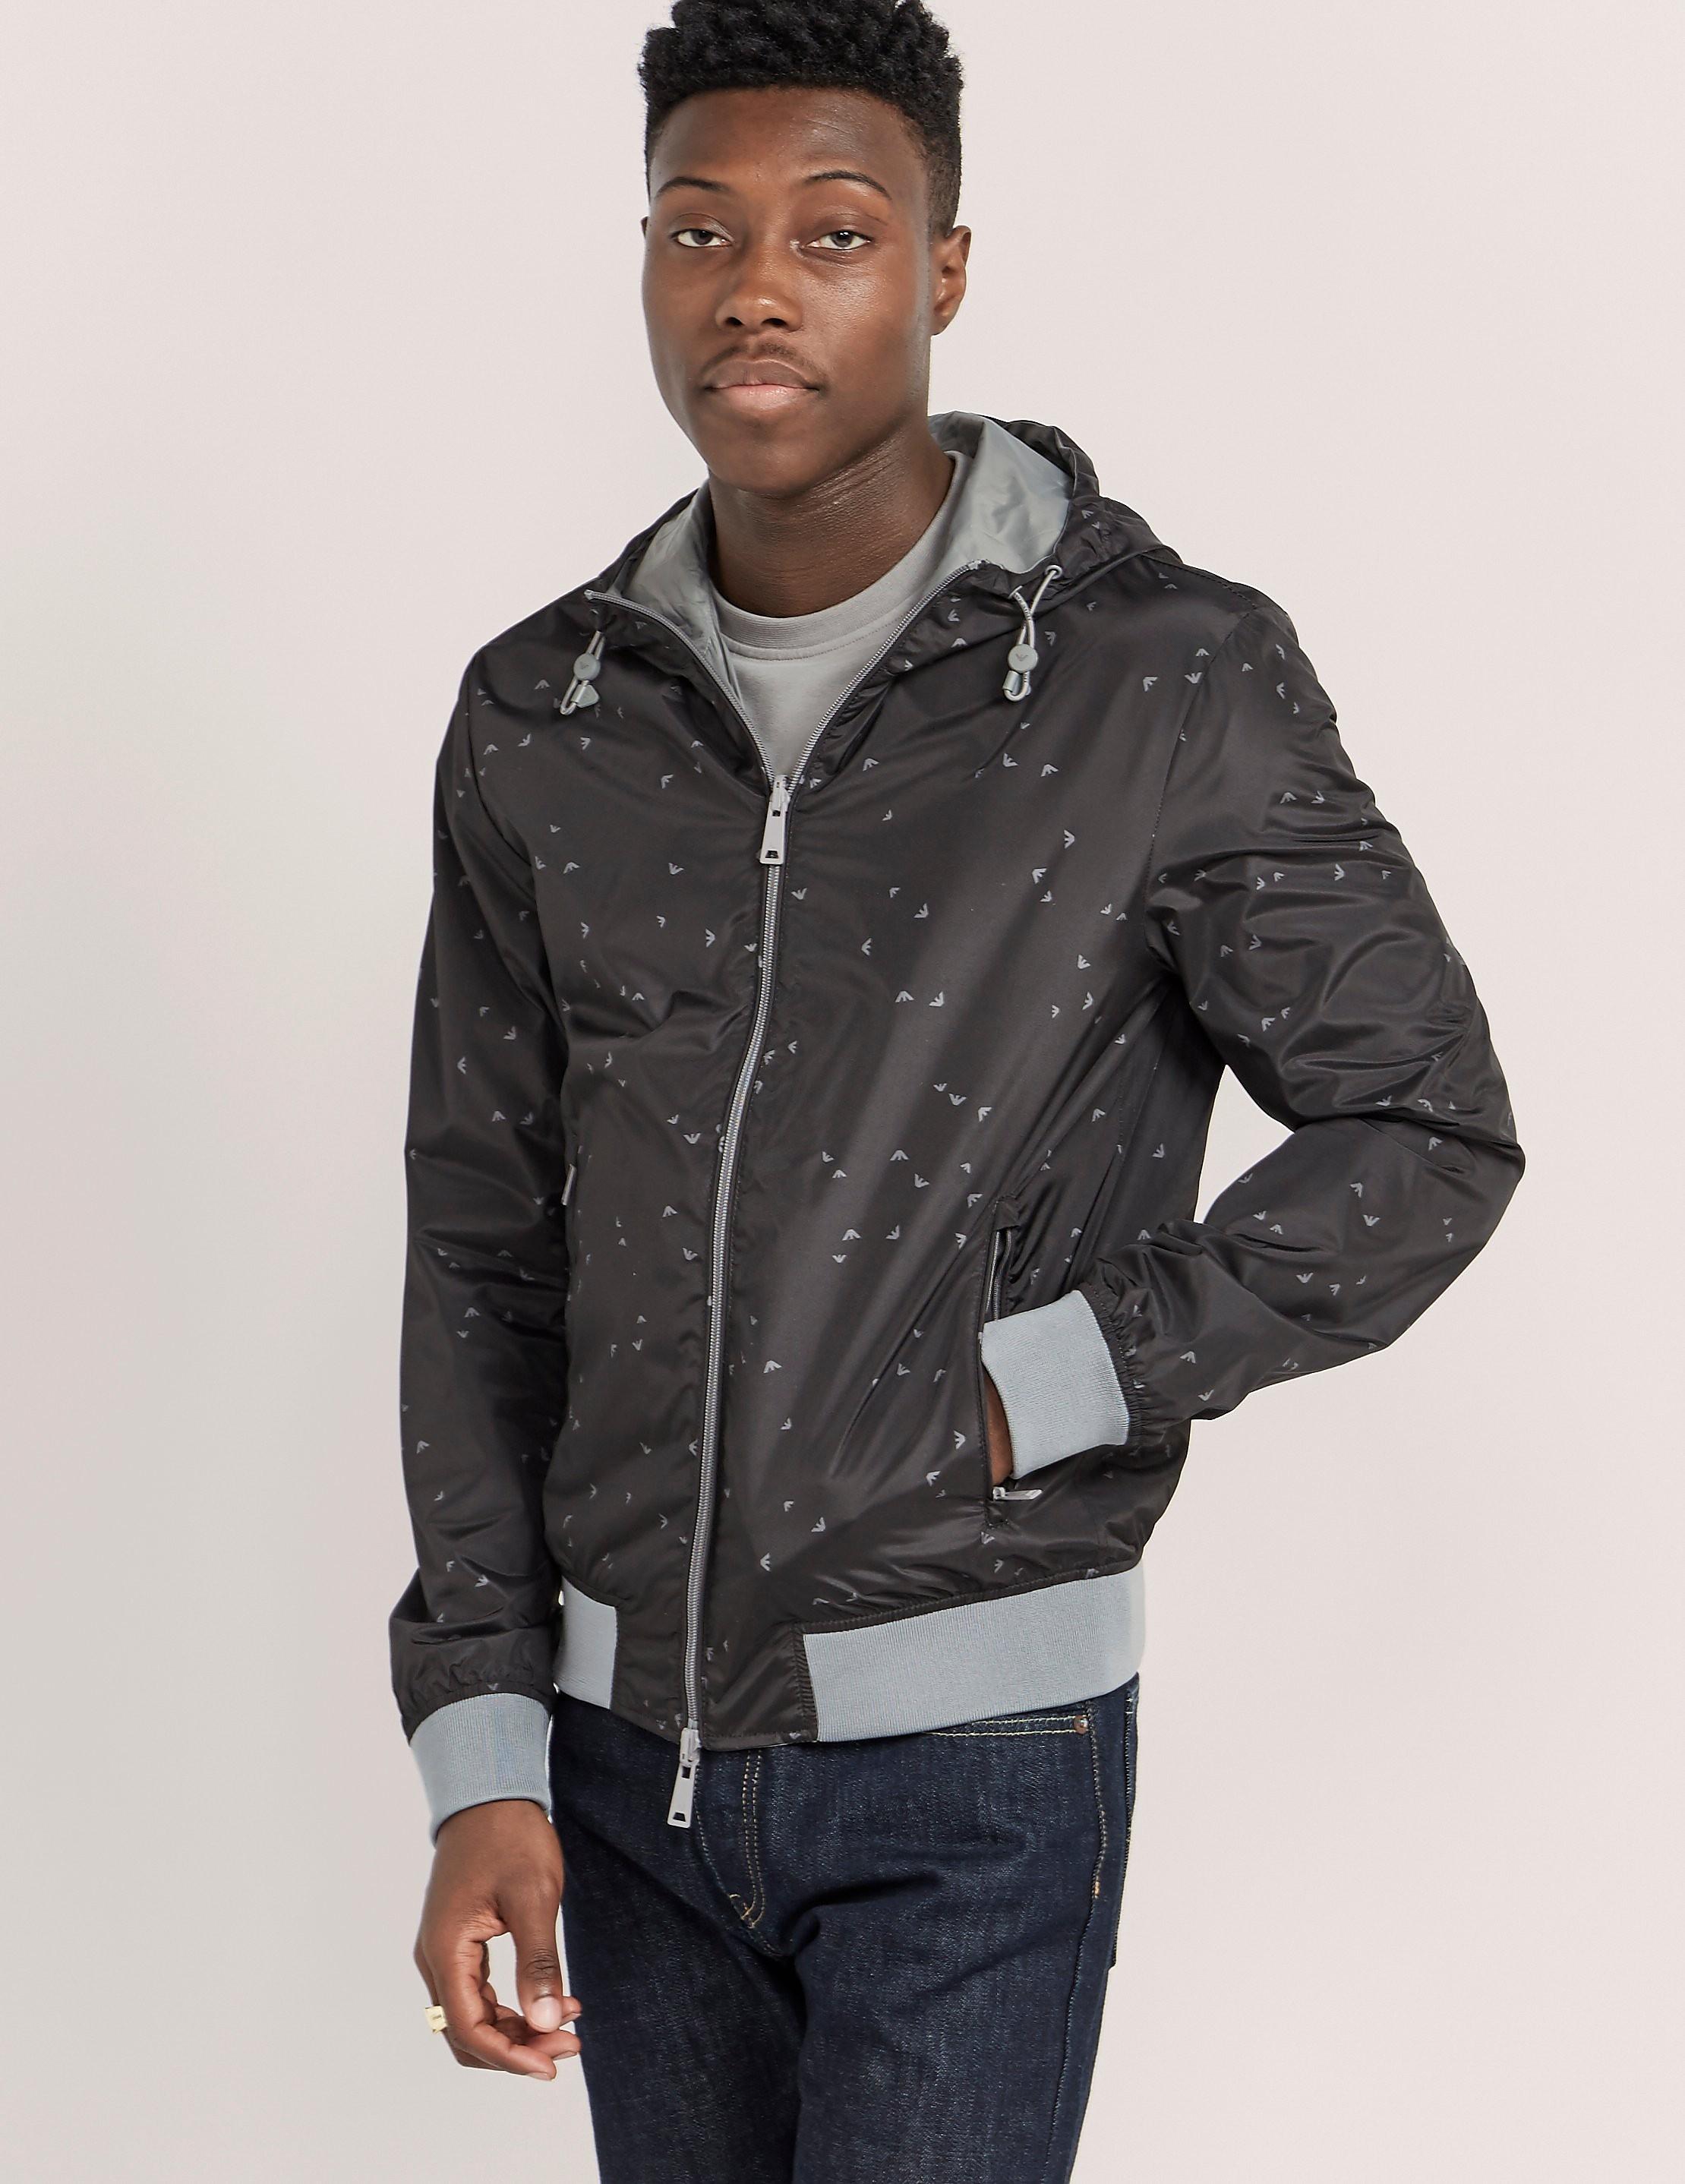 Armani Jeans Reverstible Bomber Jacket